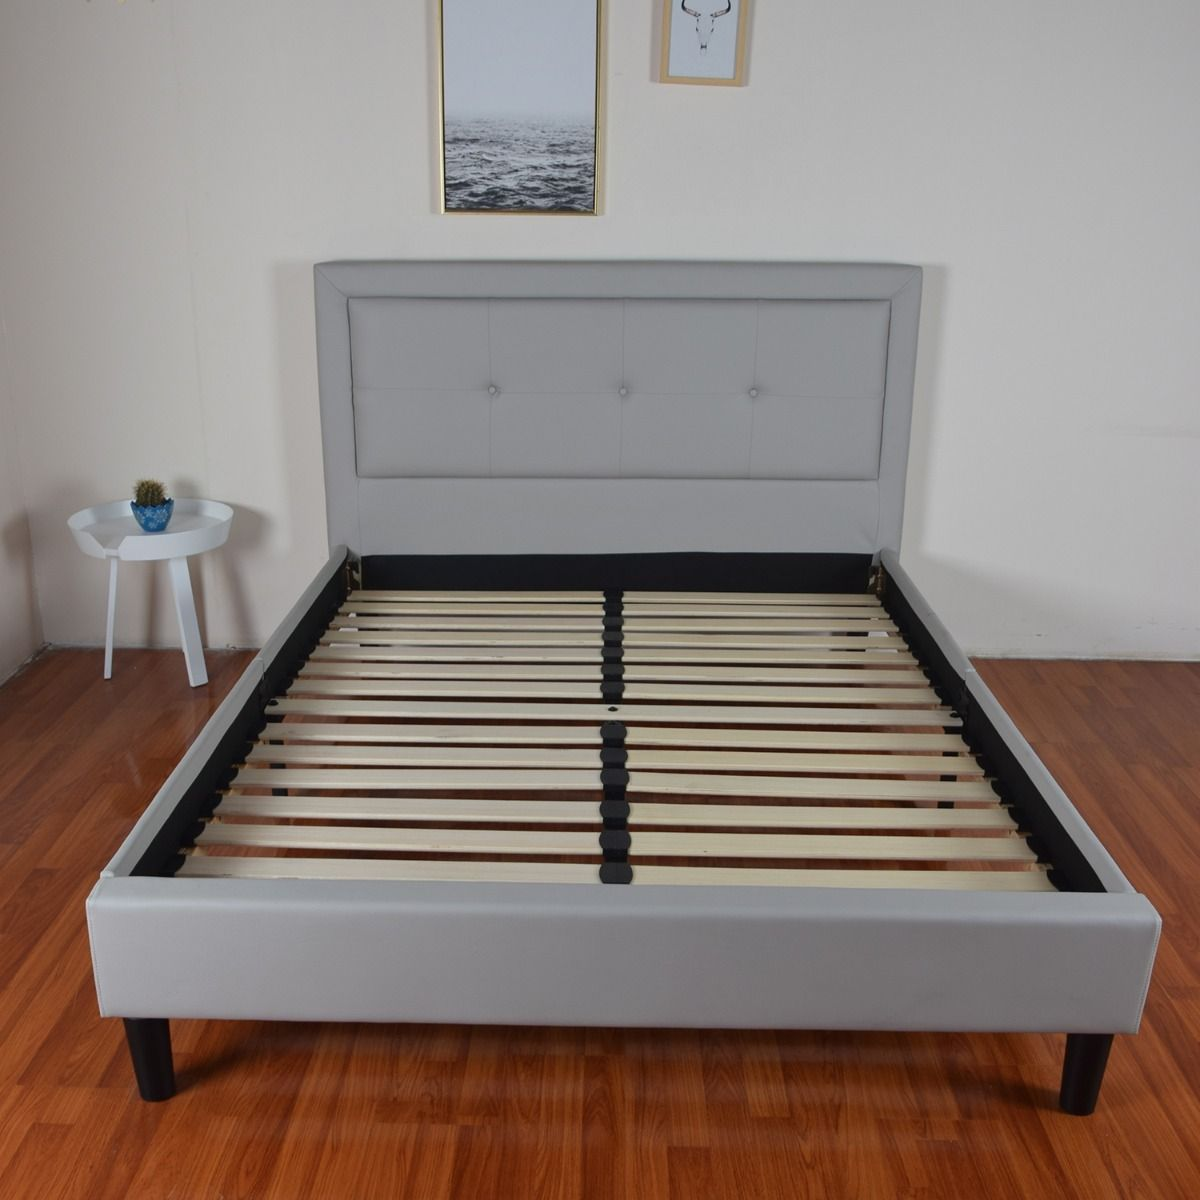 Grey Pu Upholstered Bedframe Size 209 X 151 X114 Cm Metal Legs